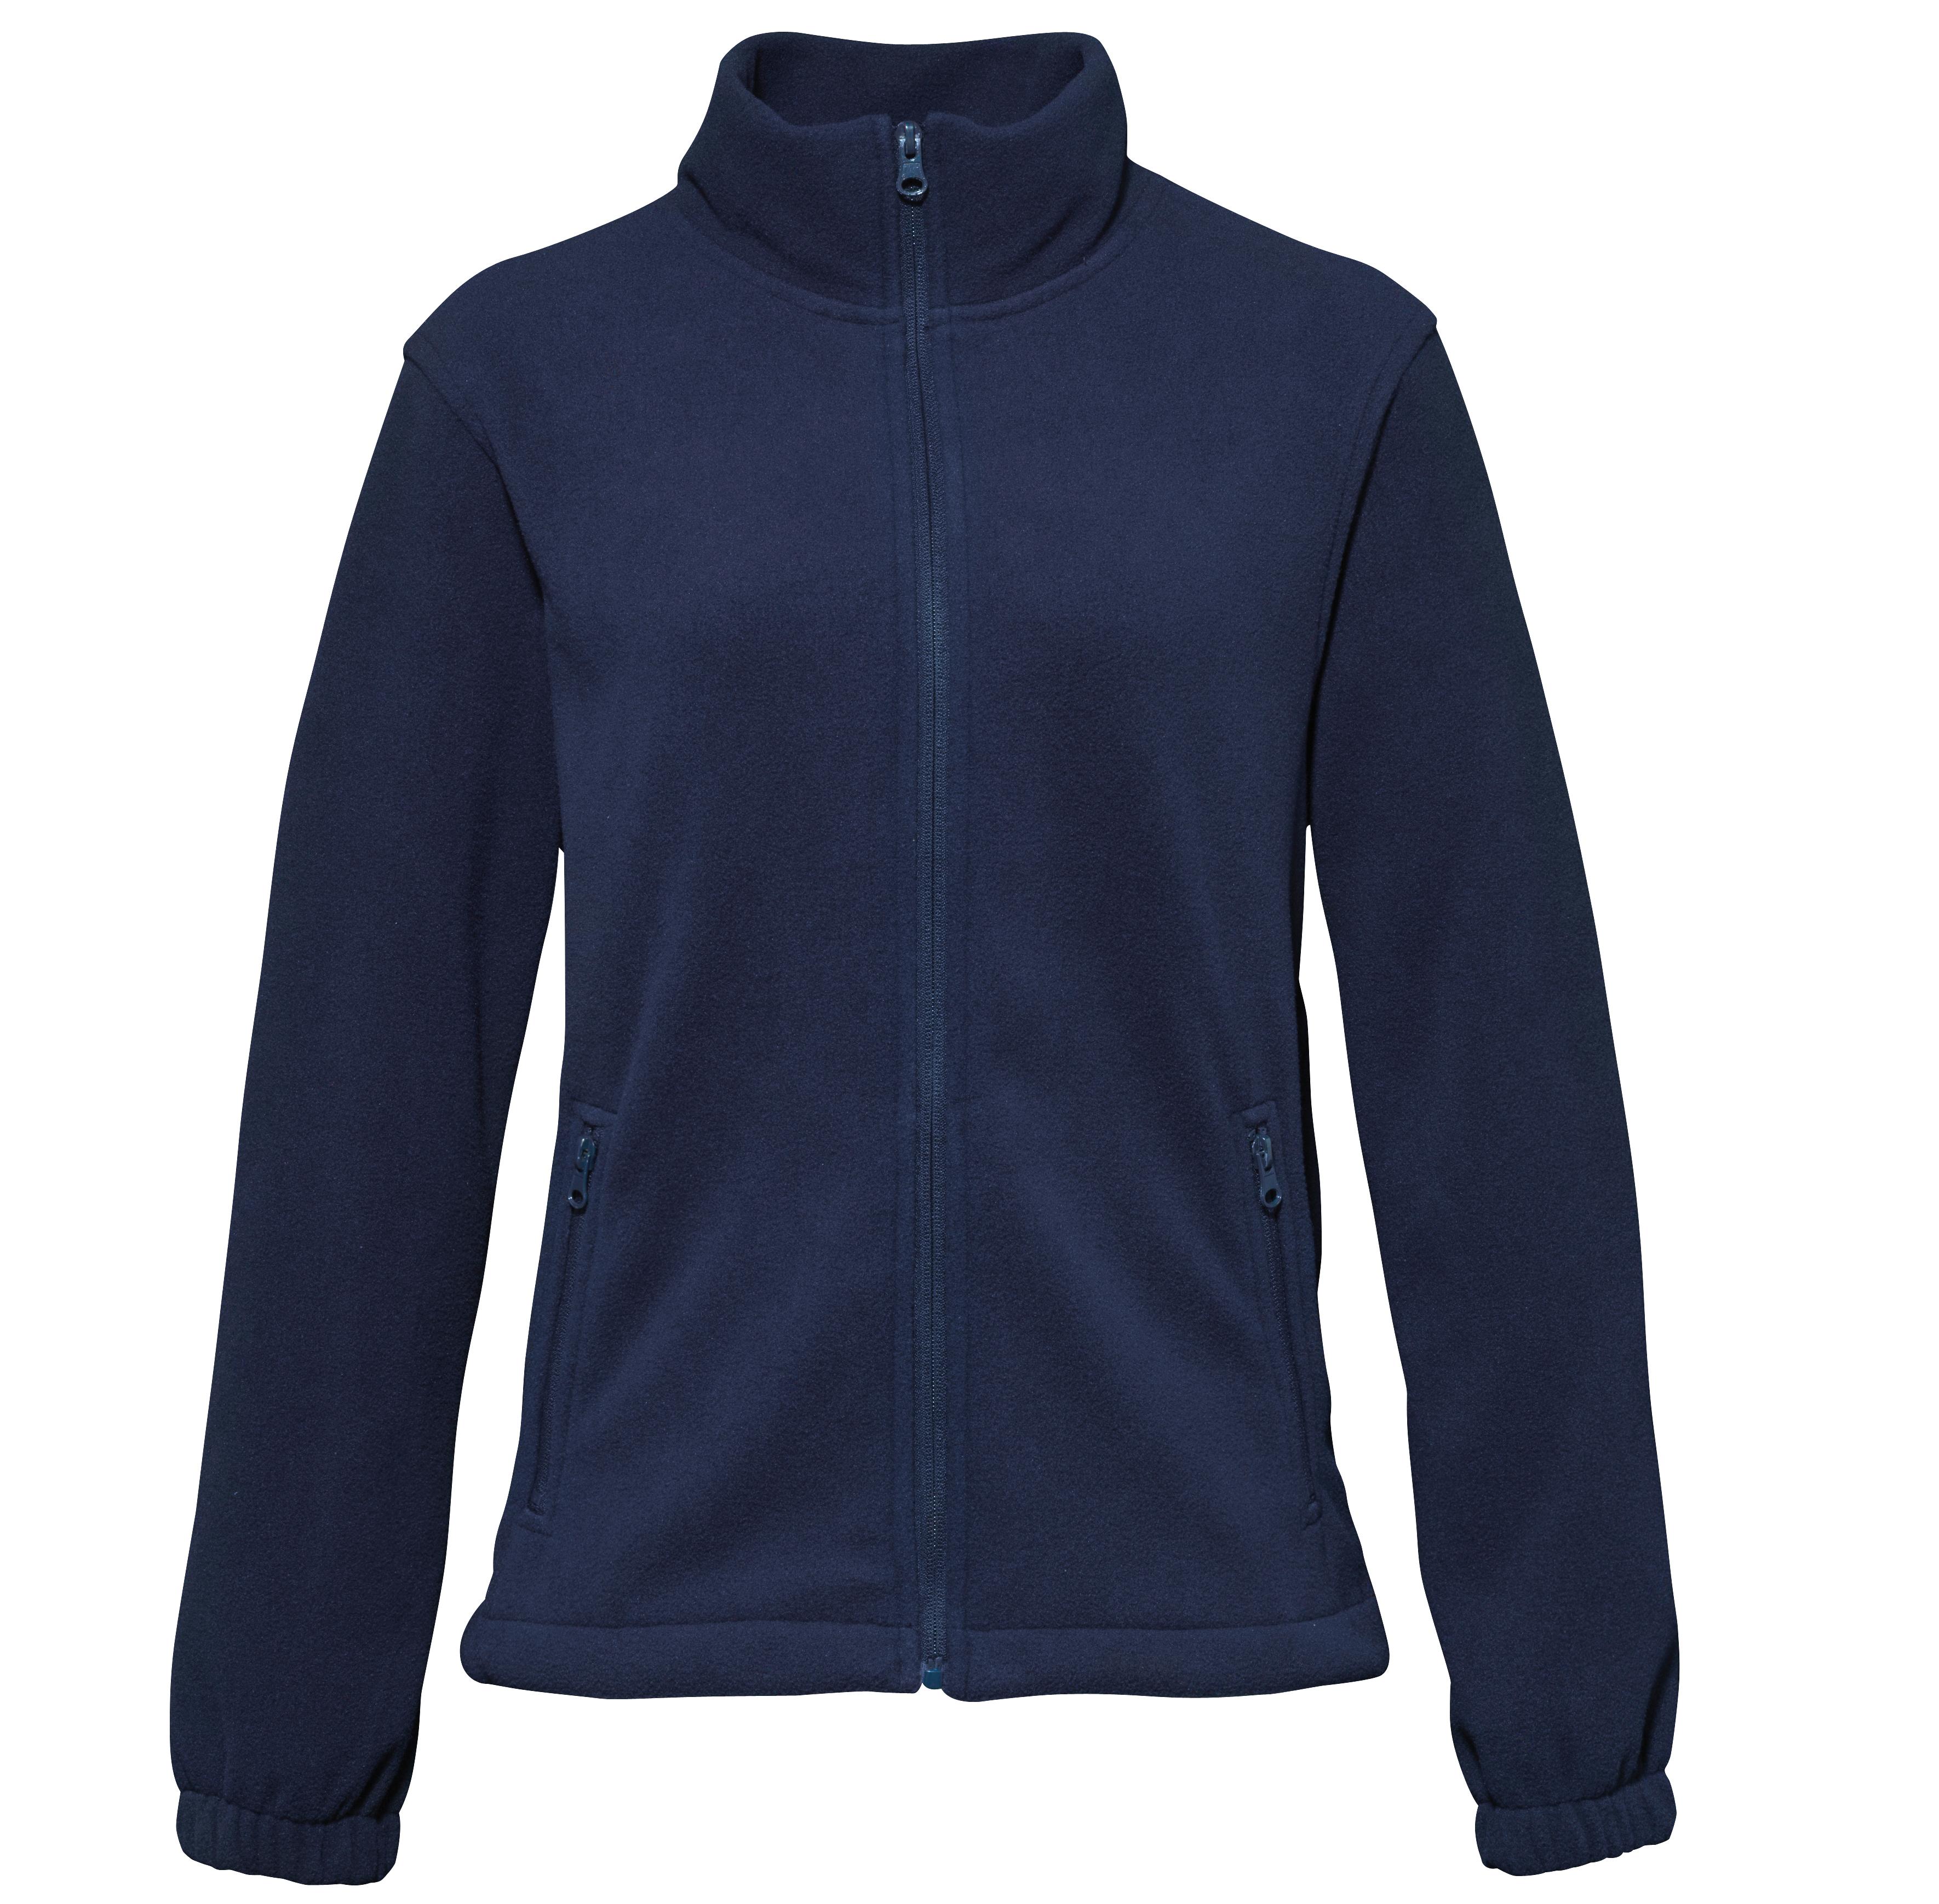 2786 Womens Casual Regular Fit Collared Zip Up Sports Fleece ...